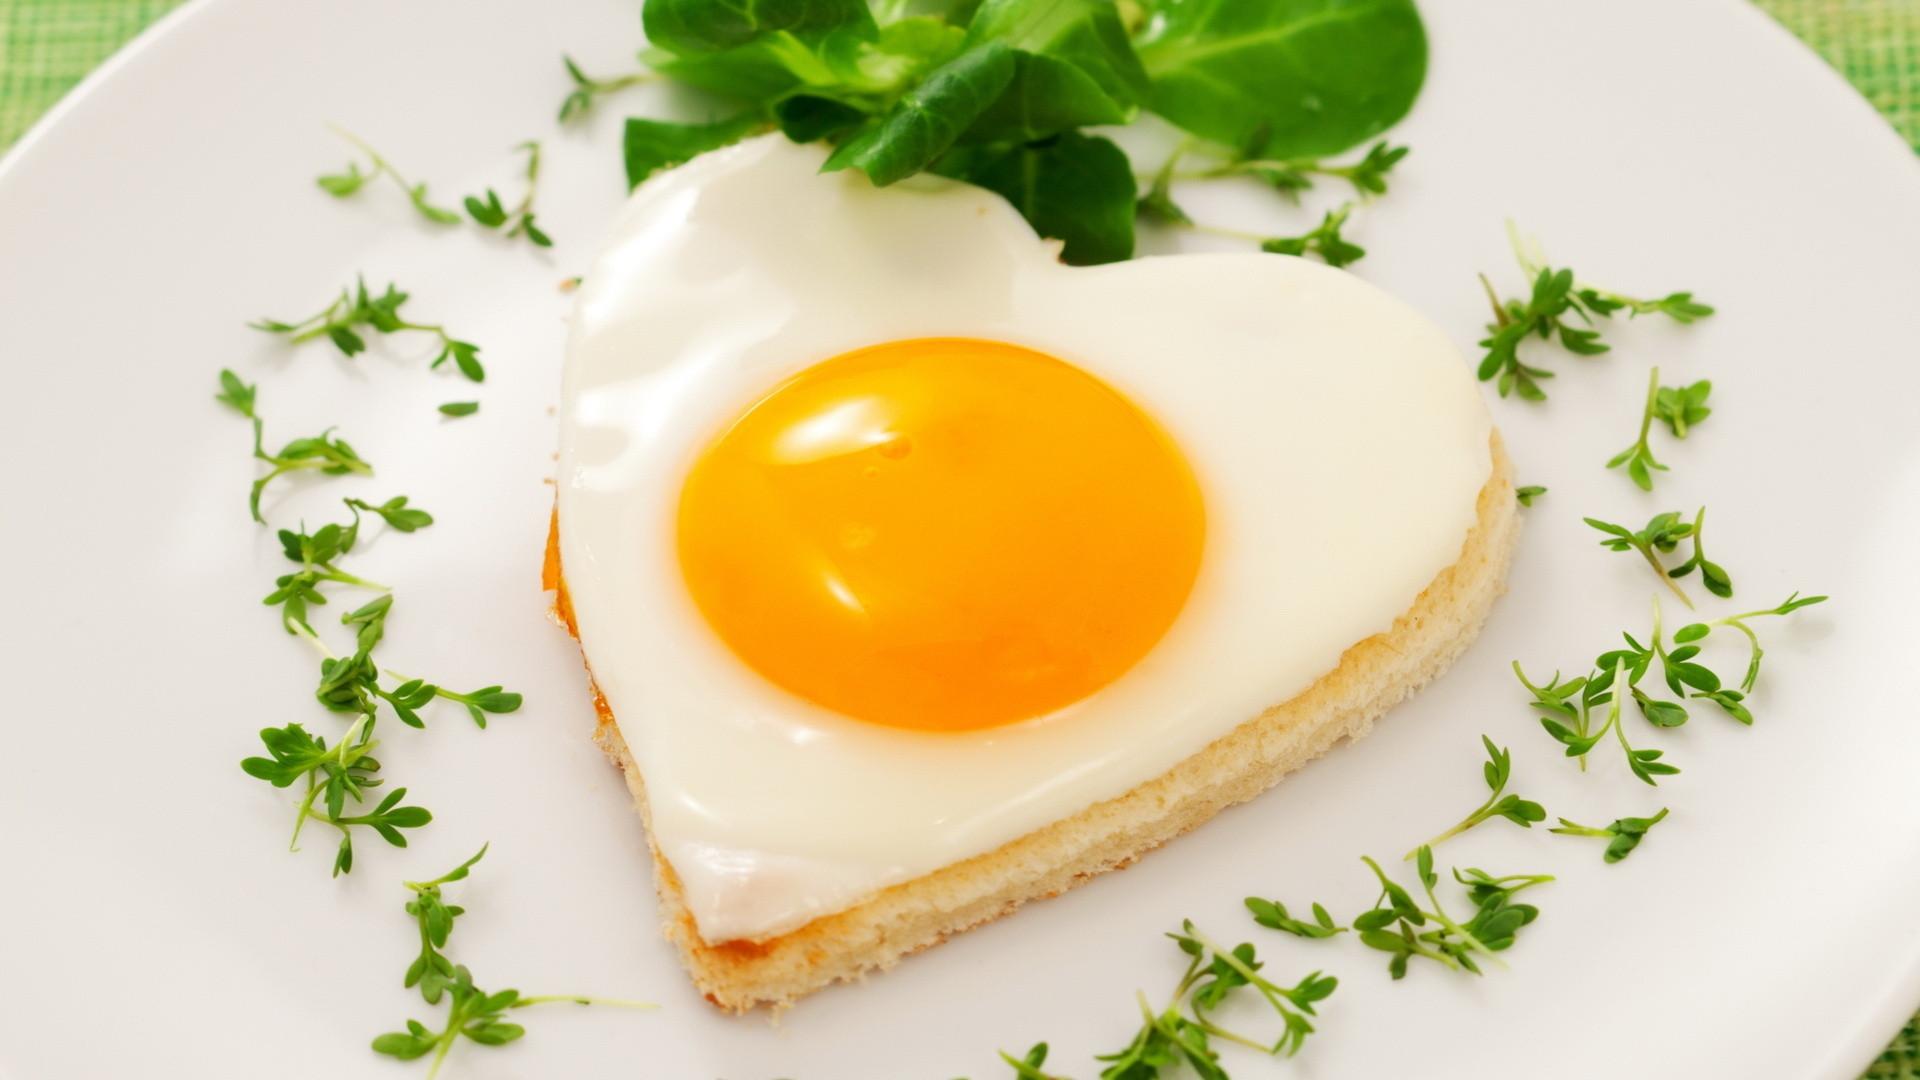 Eggs For Breakfast Healthy  Video Simple Healthy Breakfast Ideas HFR